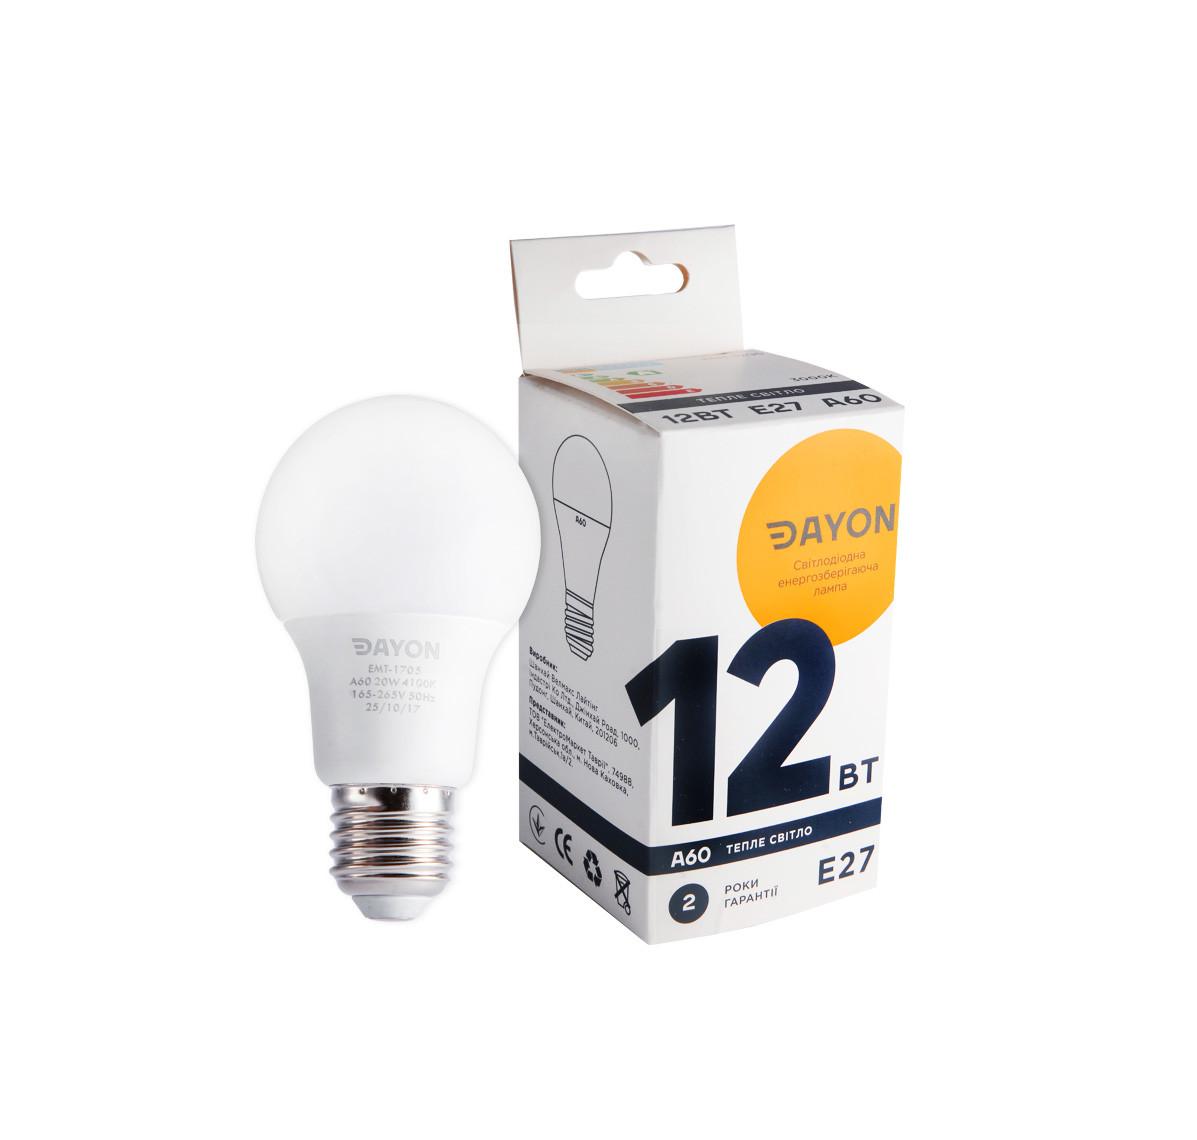 Светодиодная лампа DAYON EMT-1705 A60 12W 3000K E27